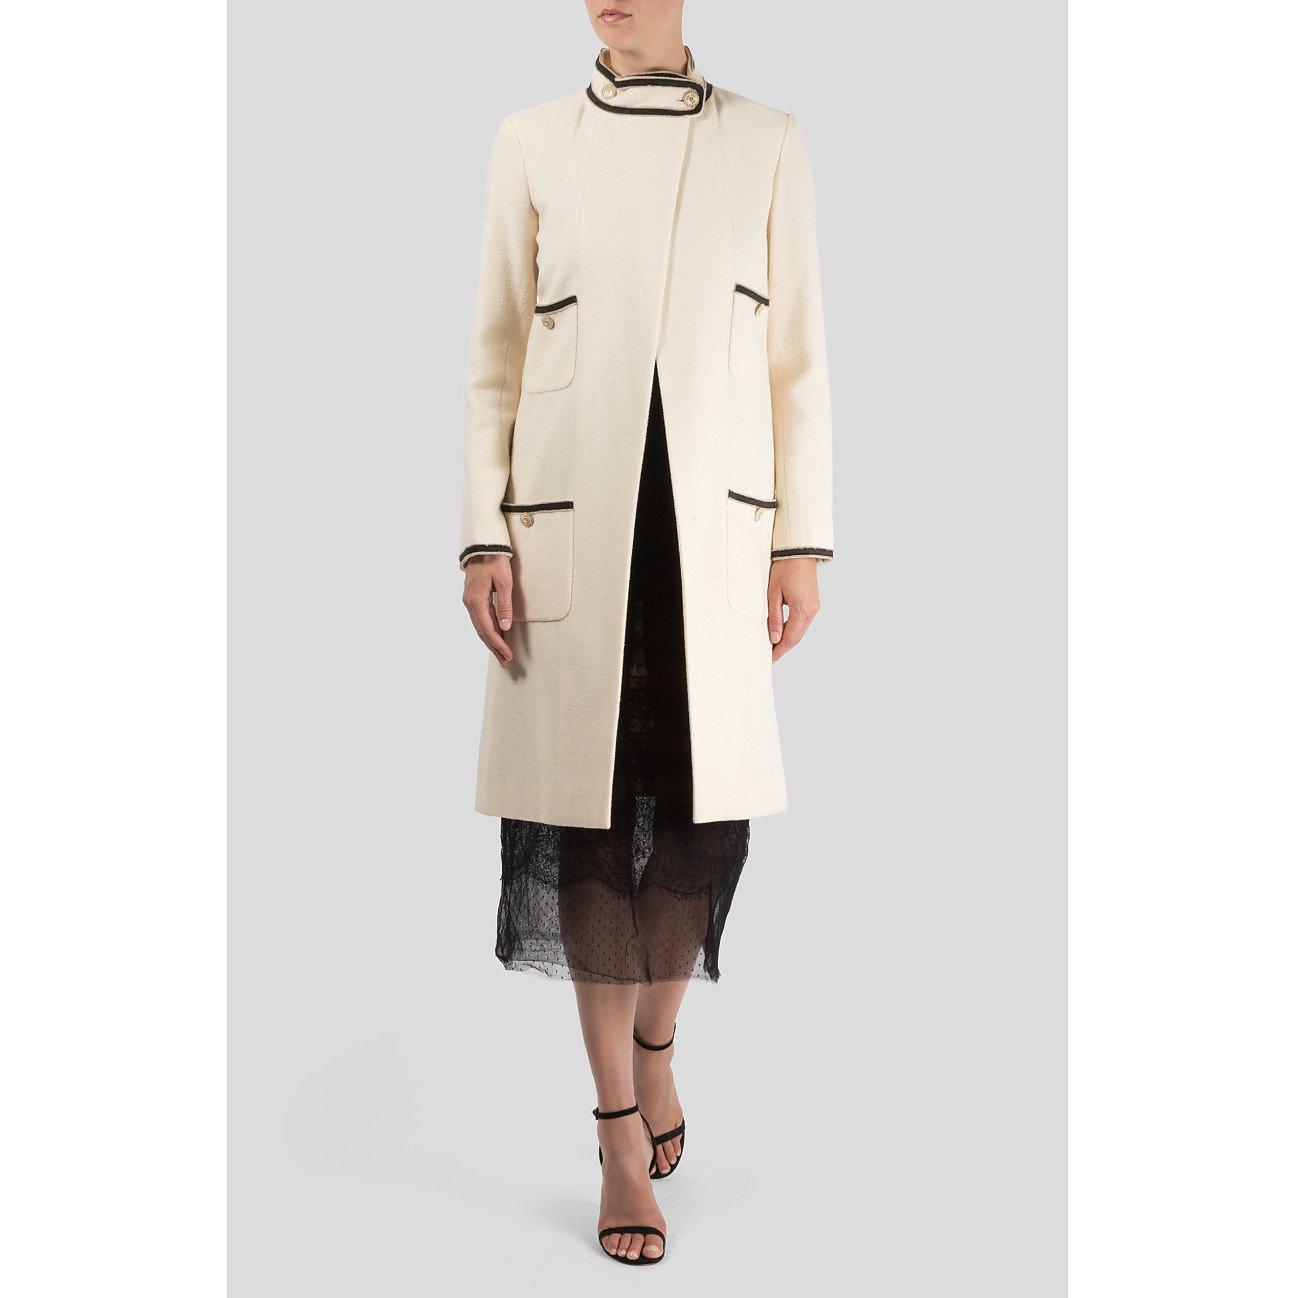 CHANEL High Neck Wool Coat